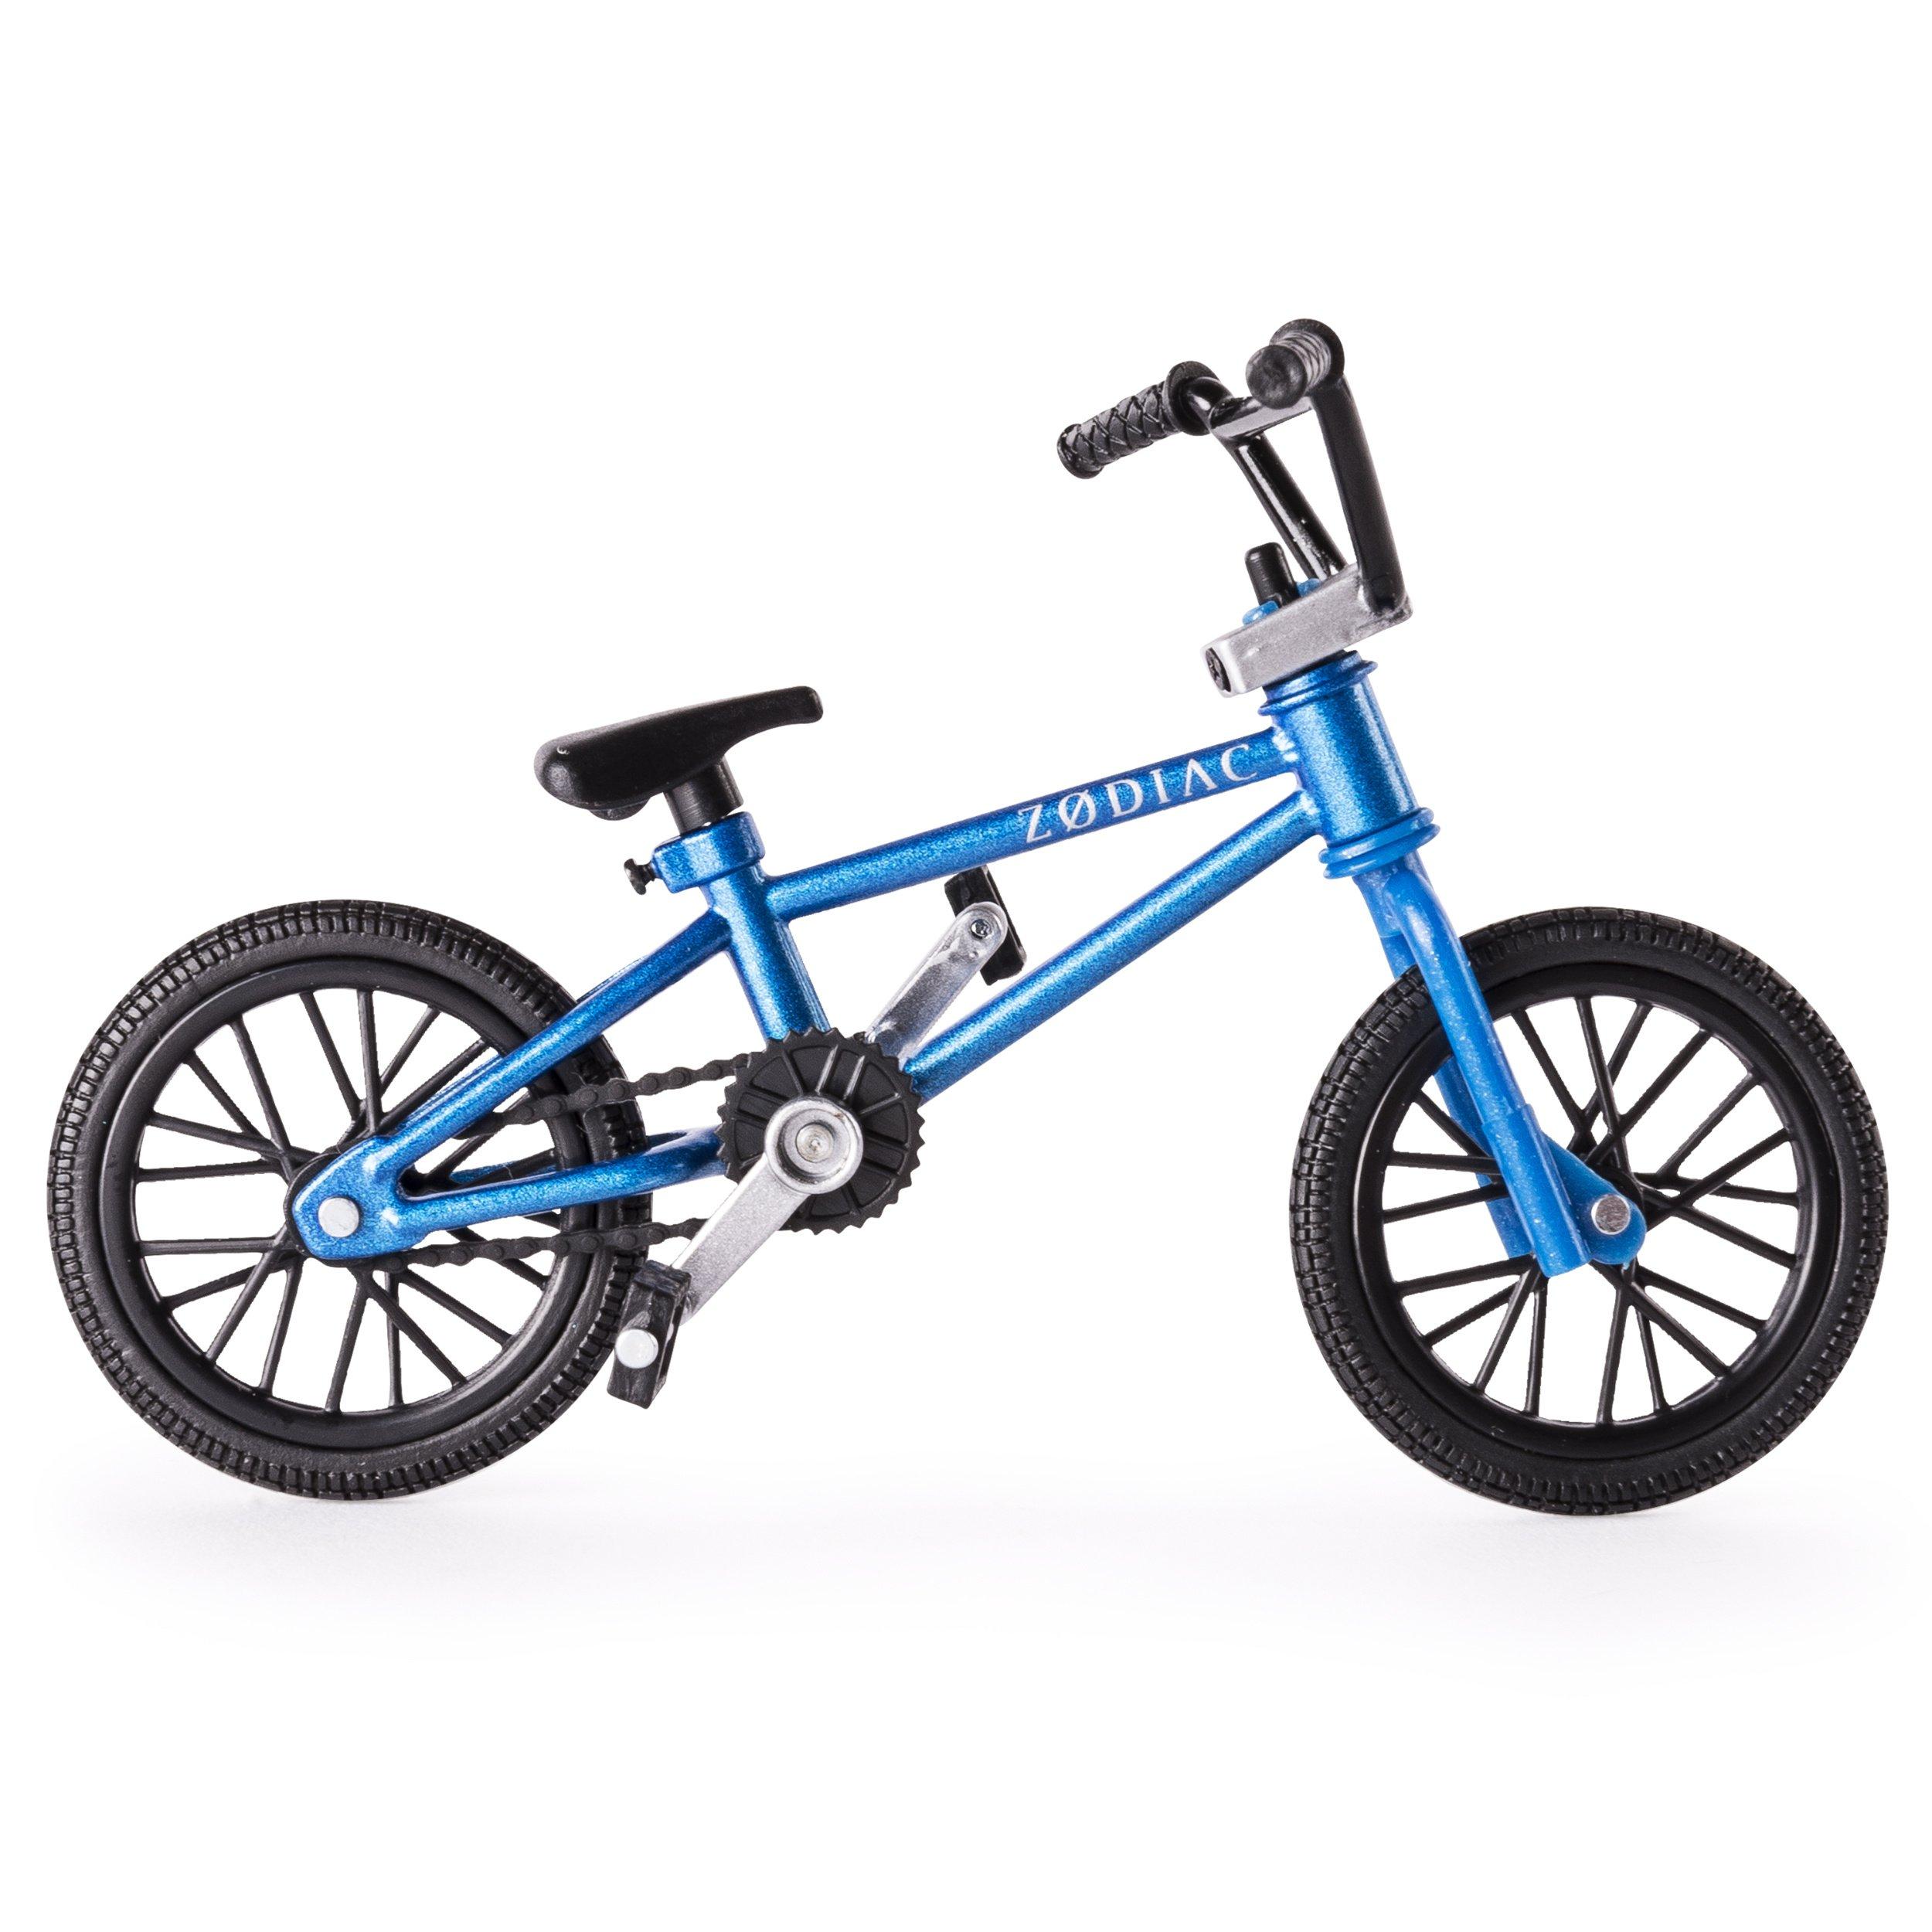 Buy Tech Deck Bmx Finger Bike Wethepeople Blue In Cheap Price On Alibaba Com